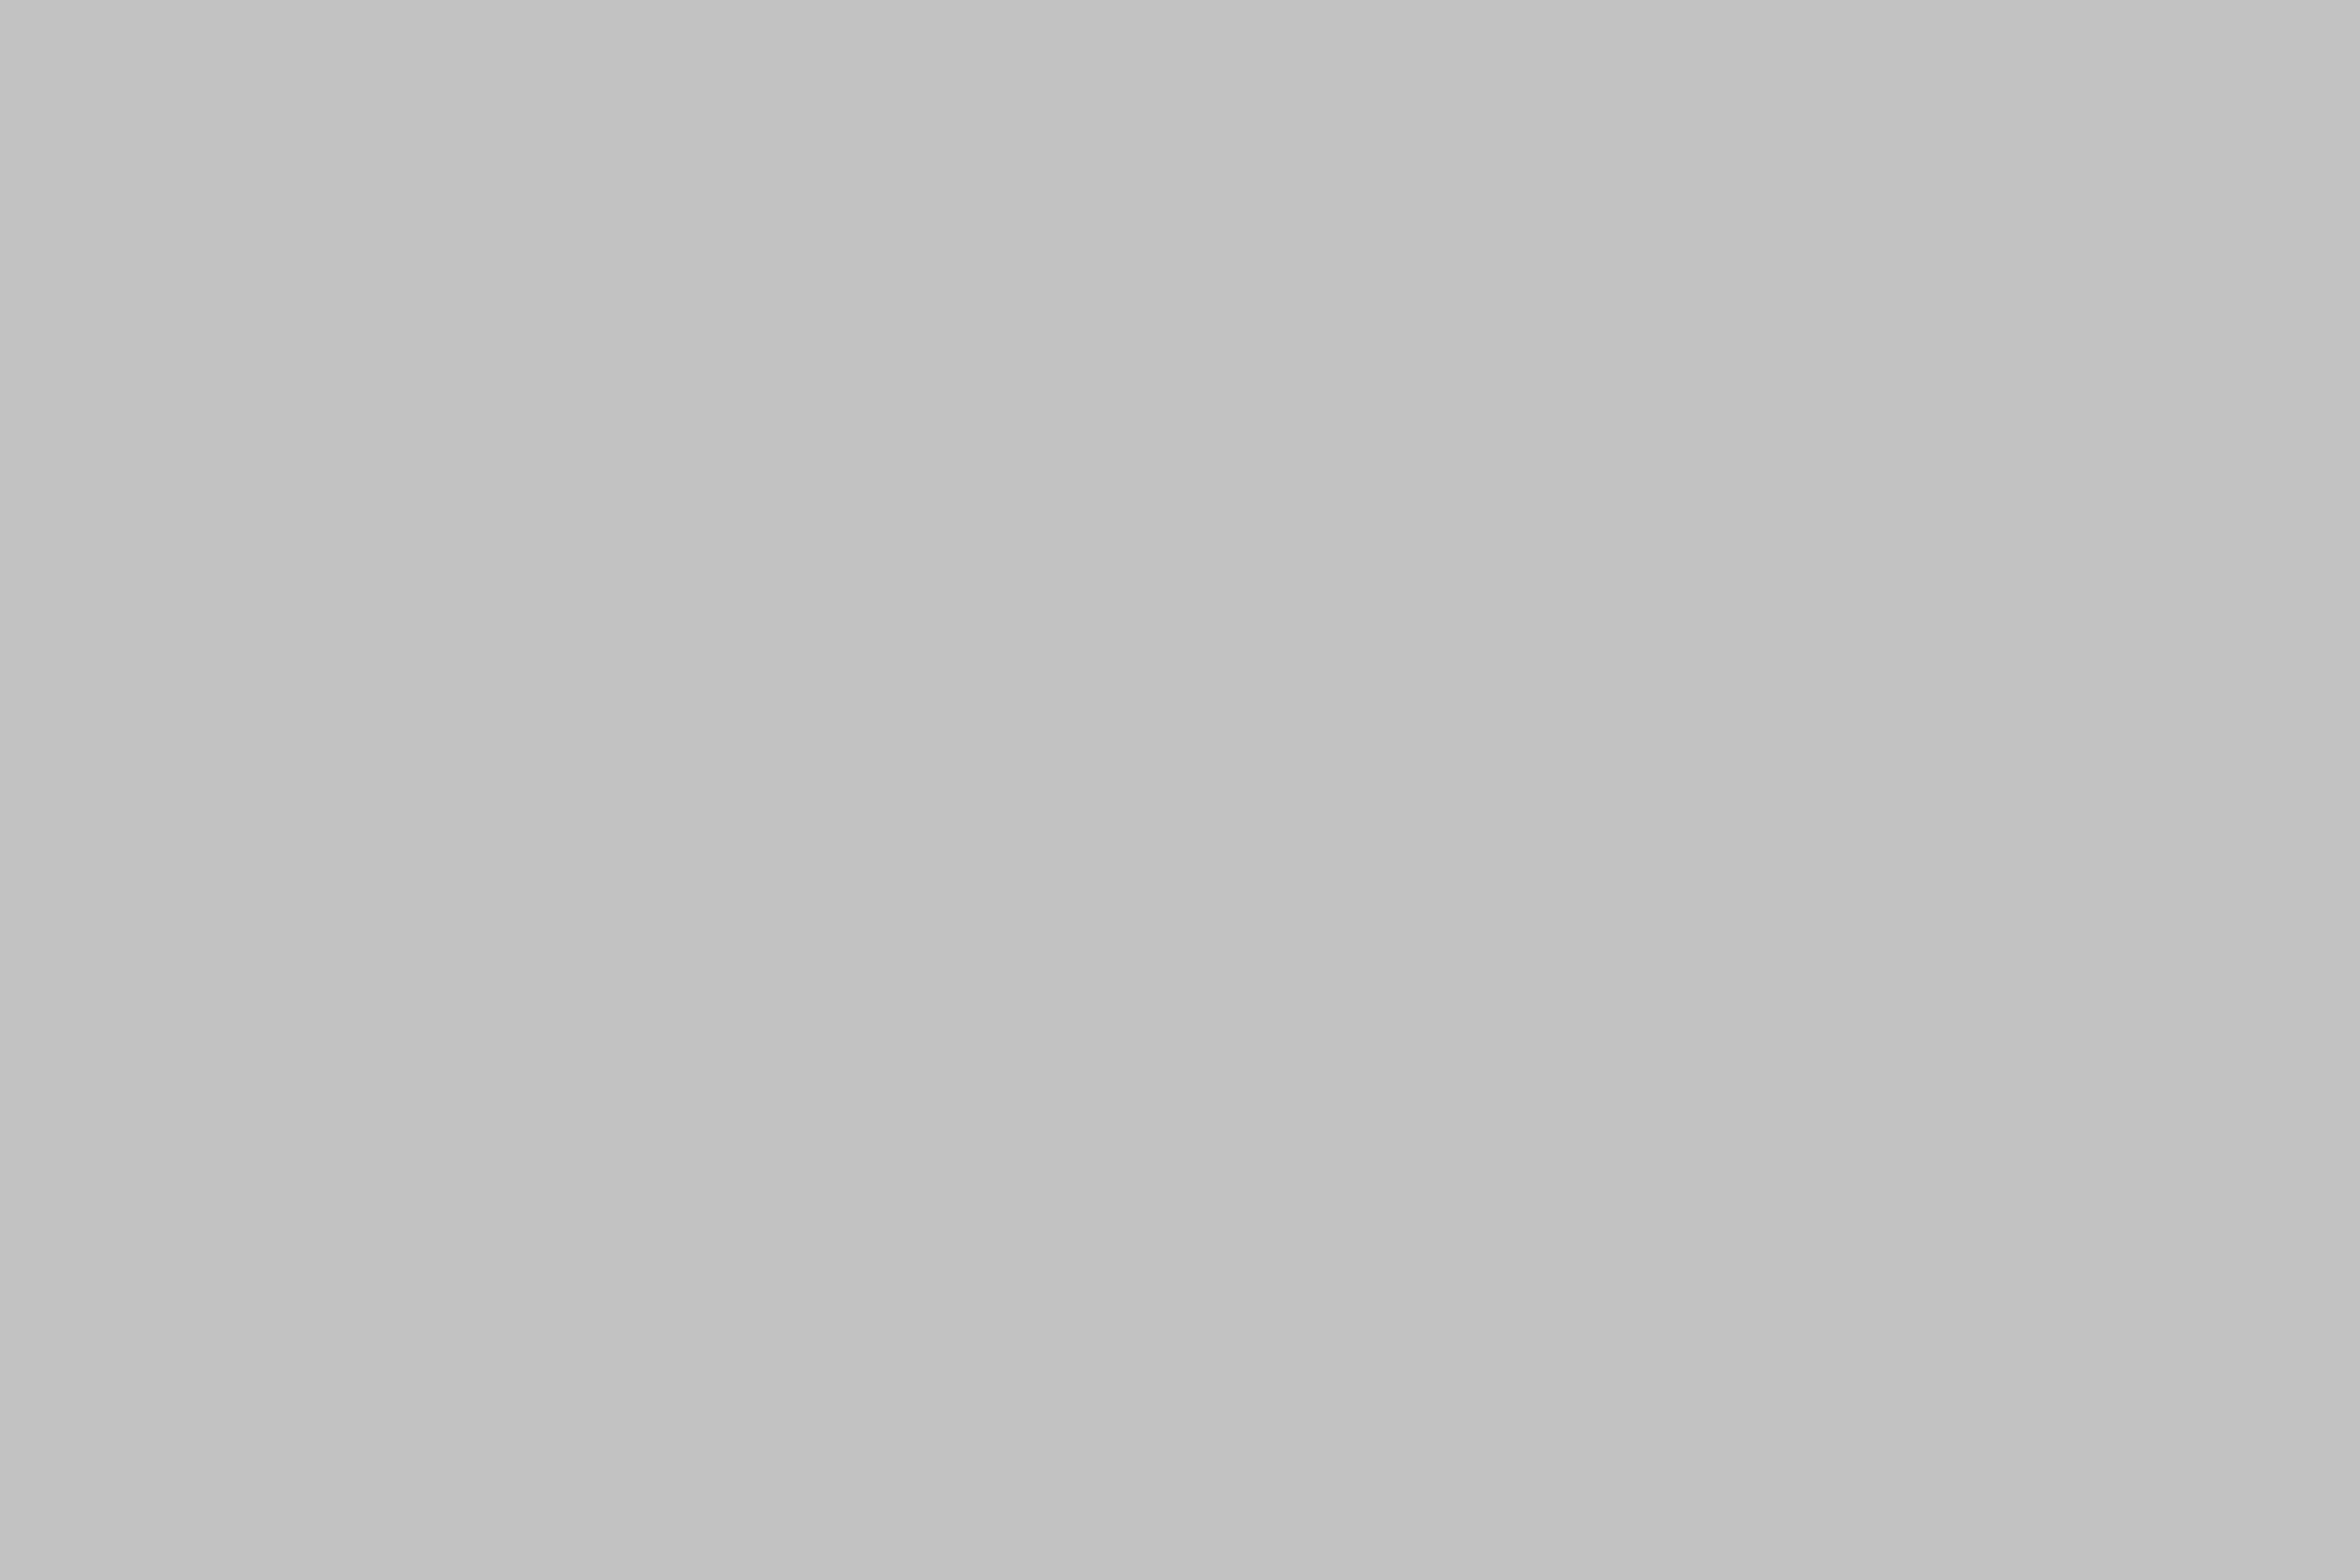 SquareSpace-SermonSeries copy.jpg